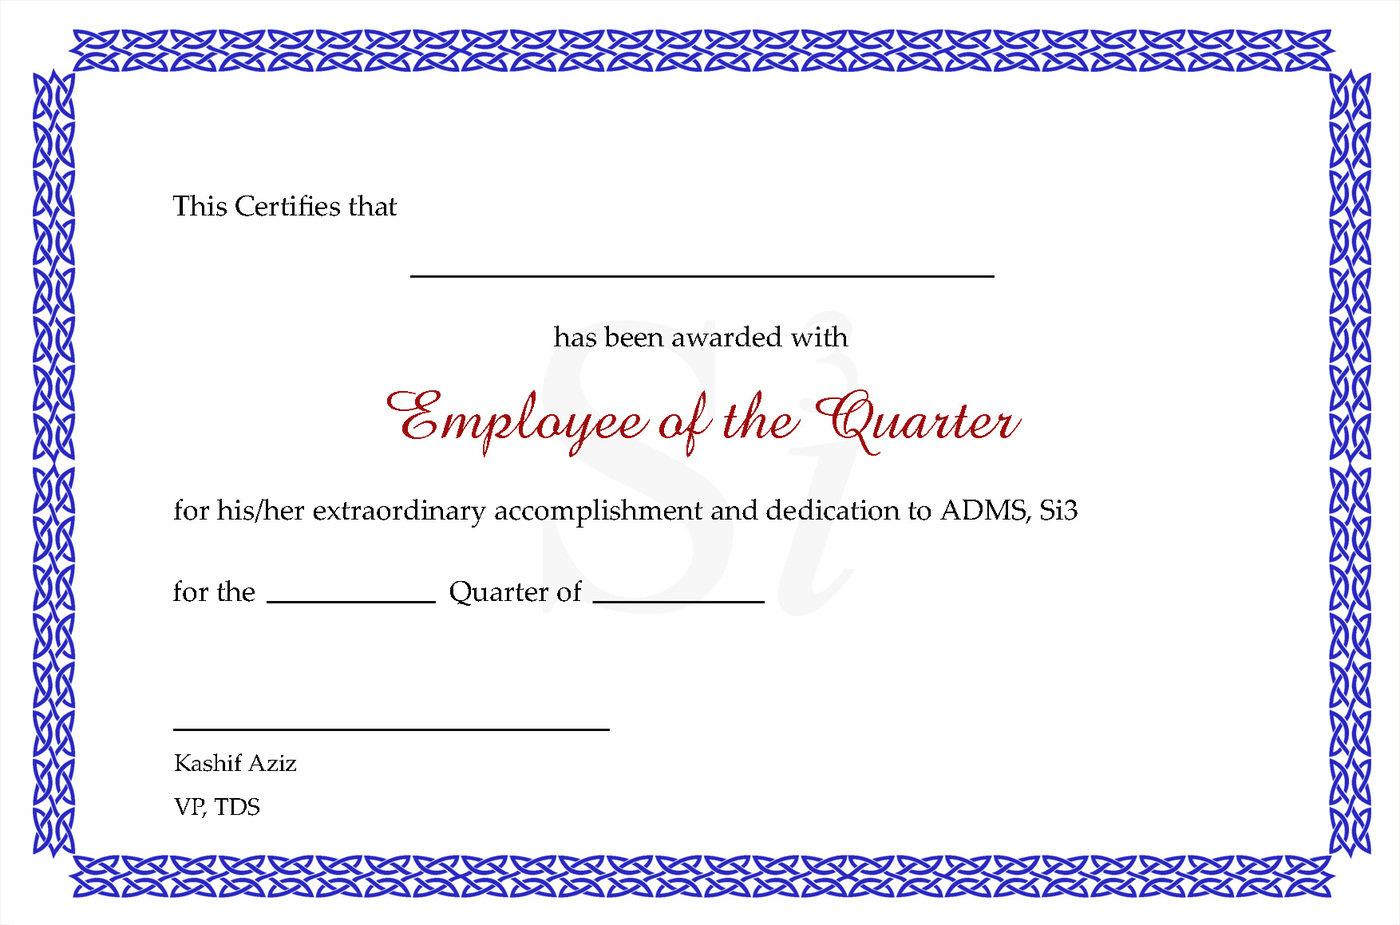 Amf Bz certificate designsraheel hassan at coroflot